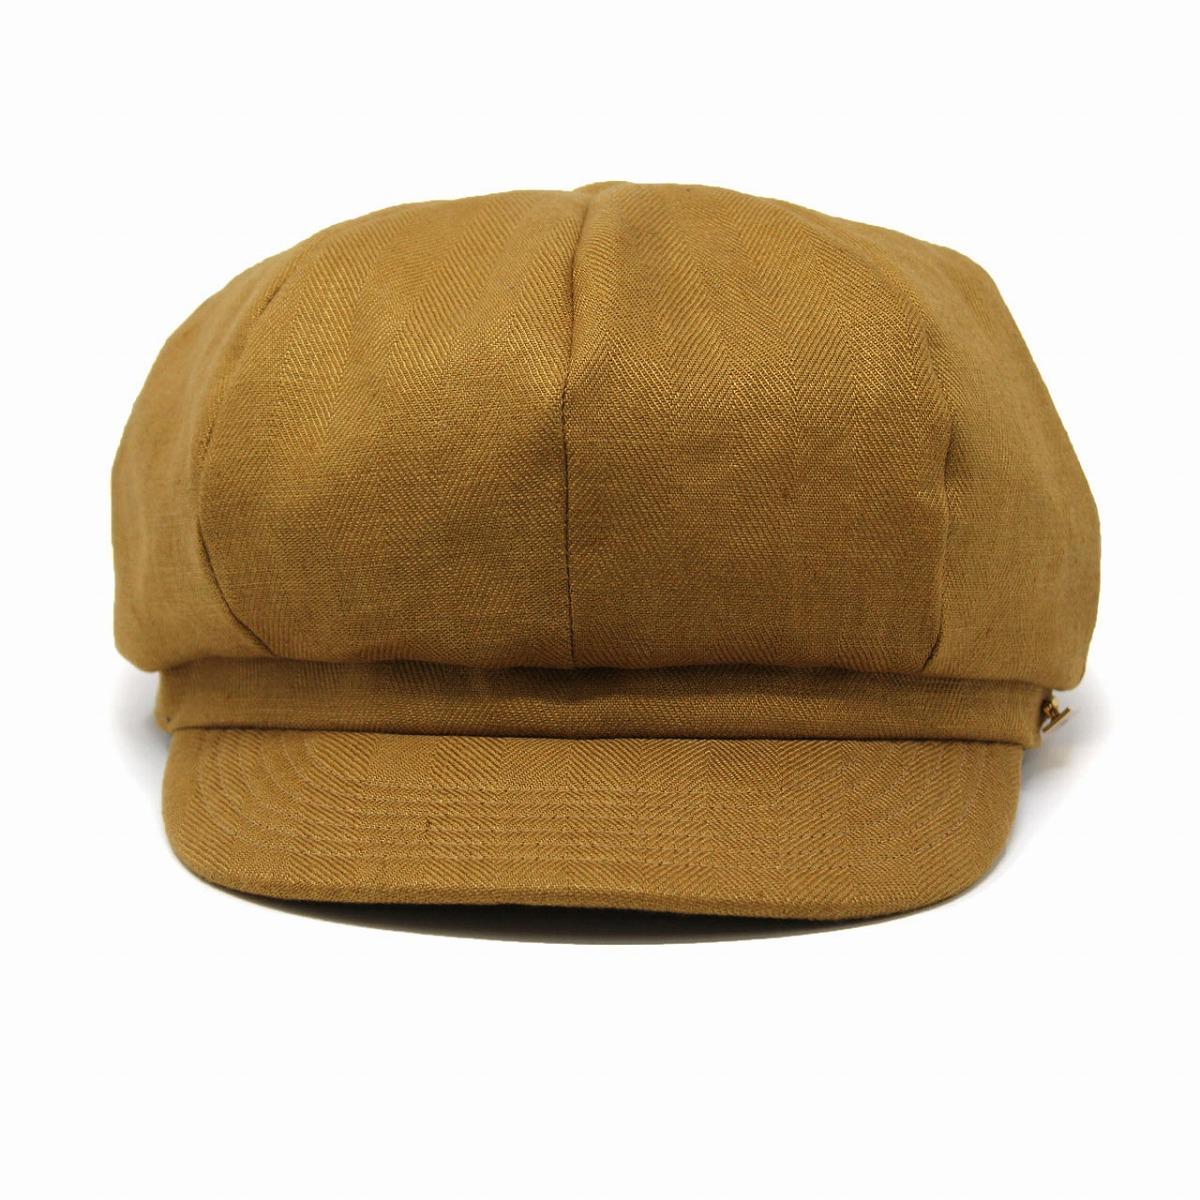 cdfcf9fb9 Linen hat men maison Bath plumply adjustable size / camel [newsboy cap]  made in silhouette casquette Lady's hemp cas casquette hat gentleman 8  panel ...